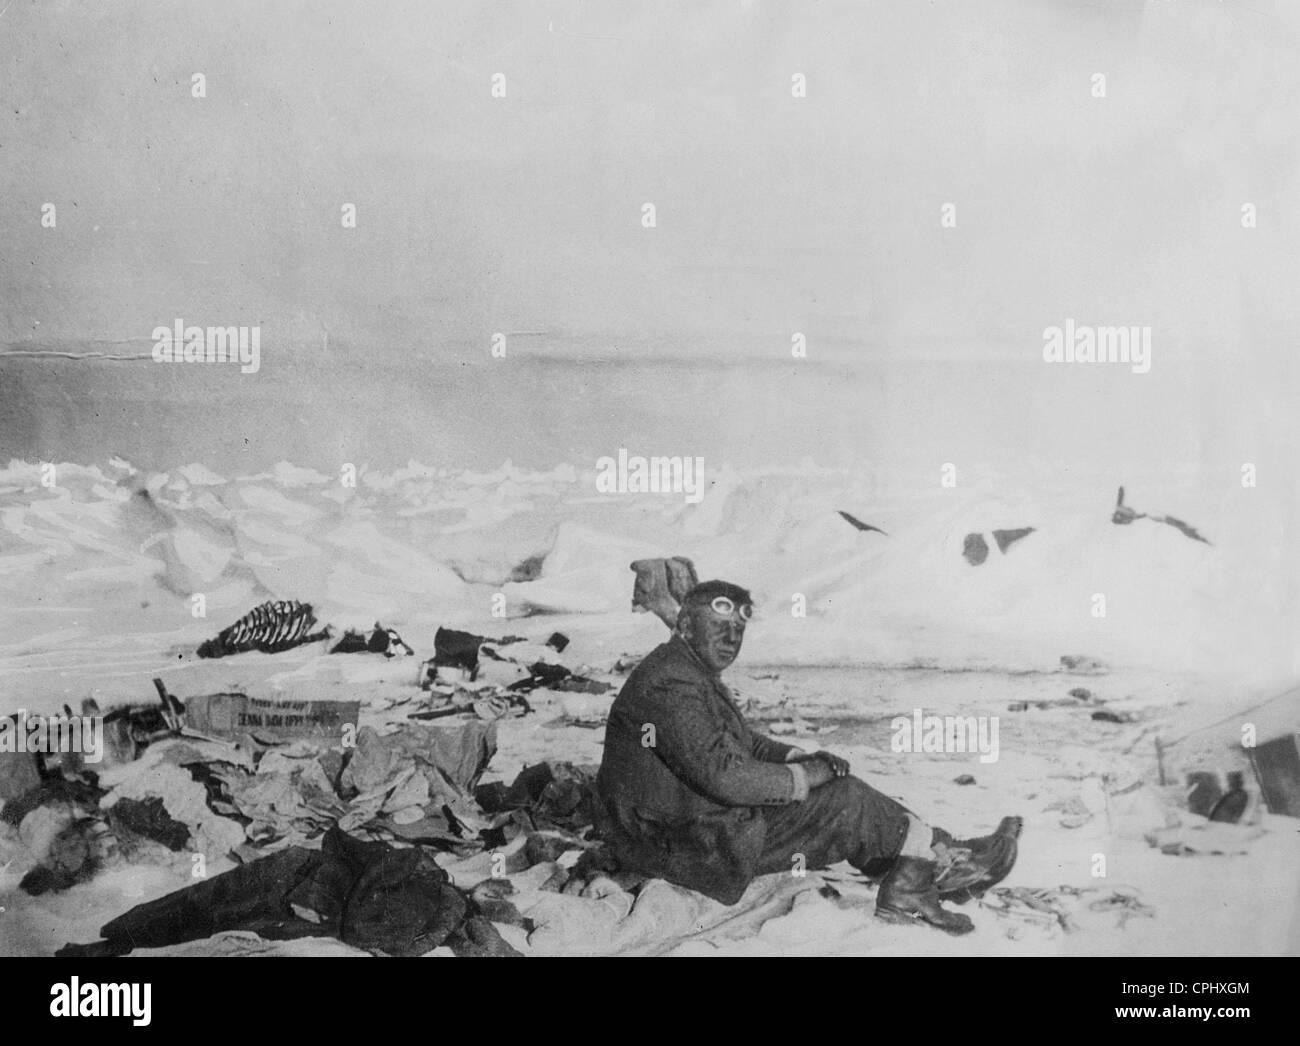 Franz Behounek on the ice floe, 1928 - Stock Image